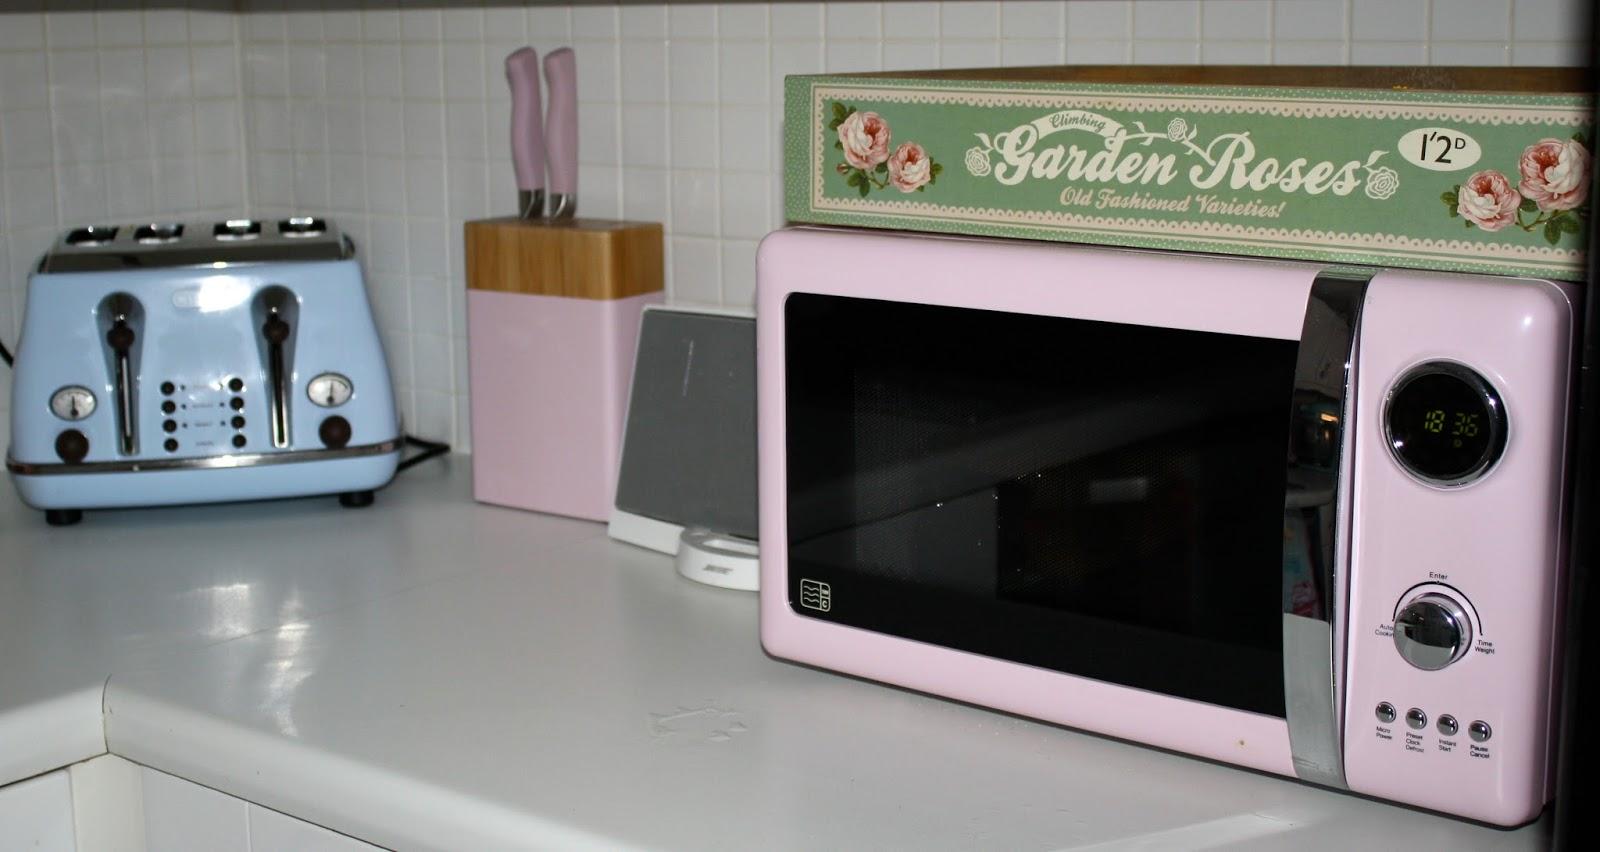 Coloured Microwaves For Sale Bestmicrowave